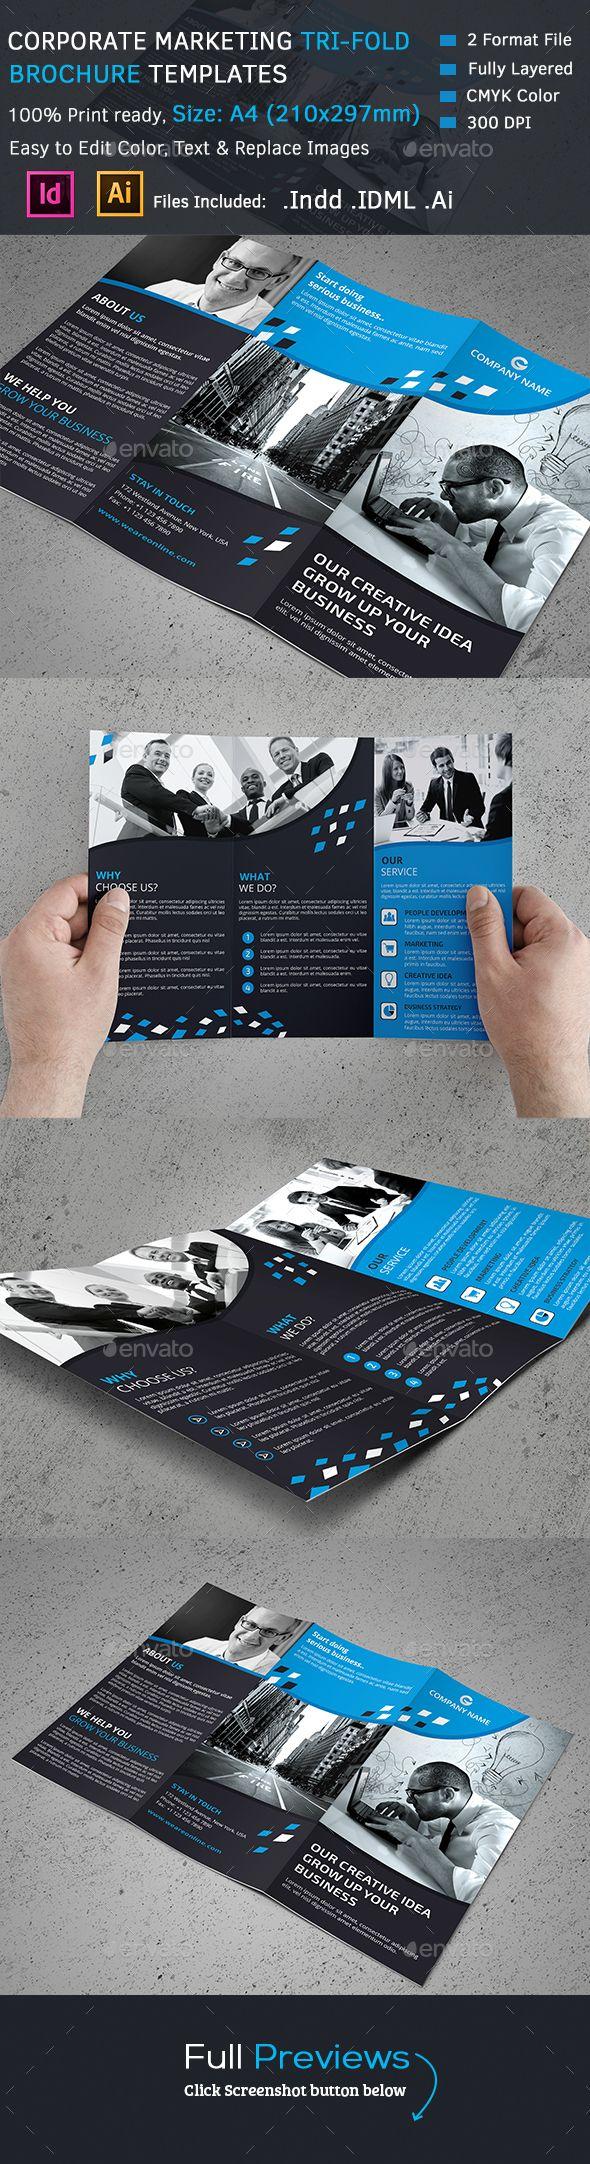 Corporate Tri-Fold Brochure Template #design Download: http://graphicriver.net/item/corporate-trifold-brochure/13082370?ref=ksioks